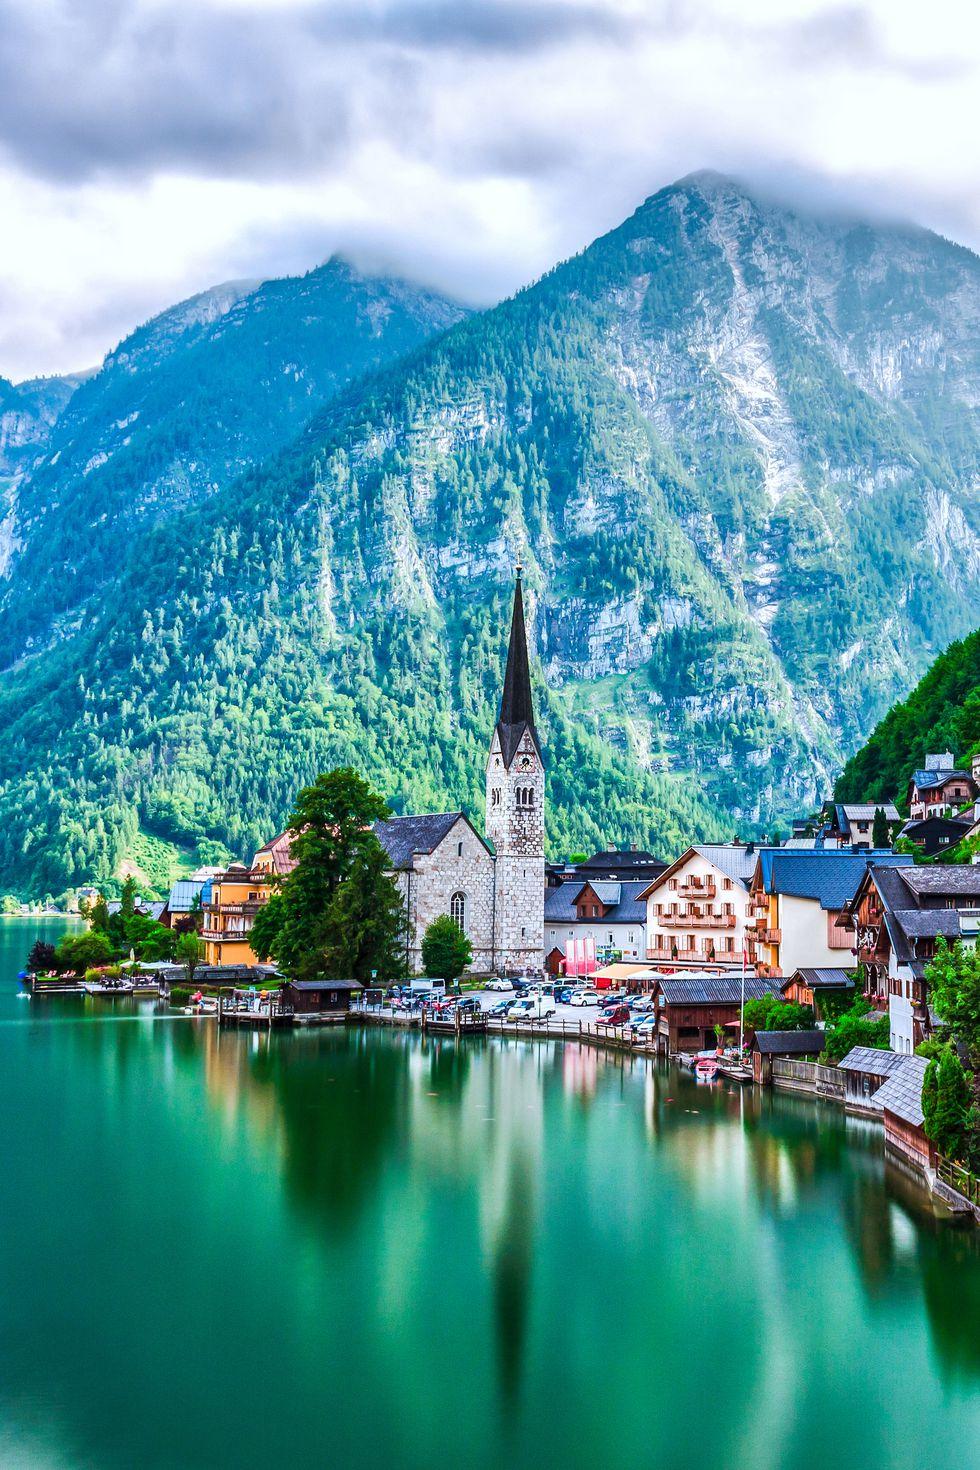 Халщадт, Австрия